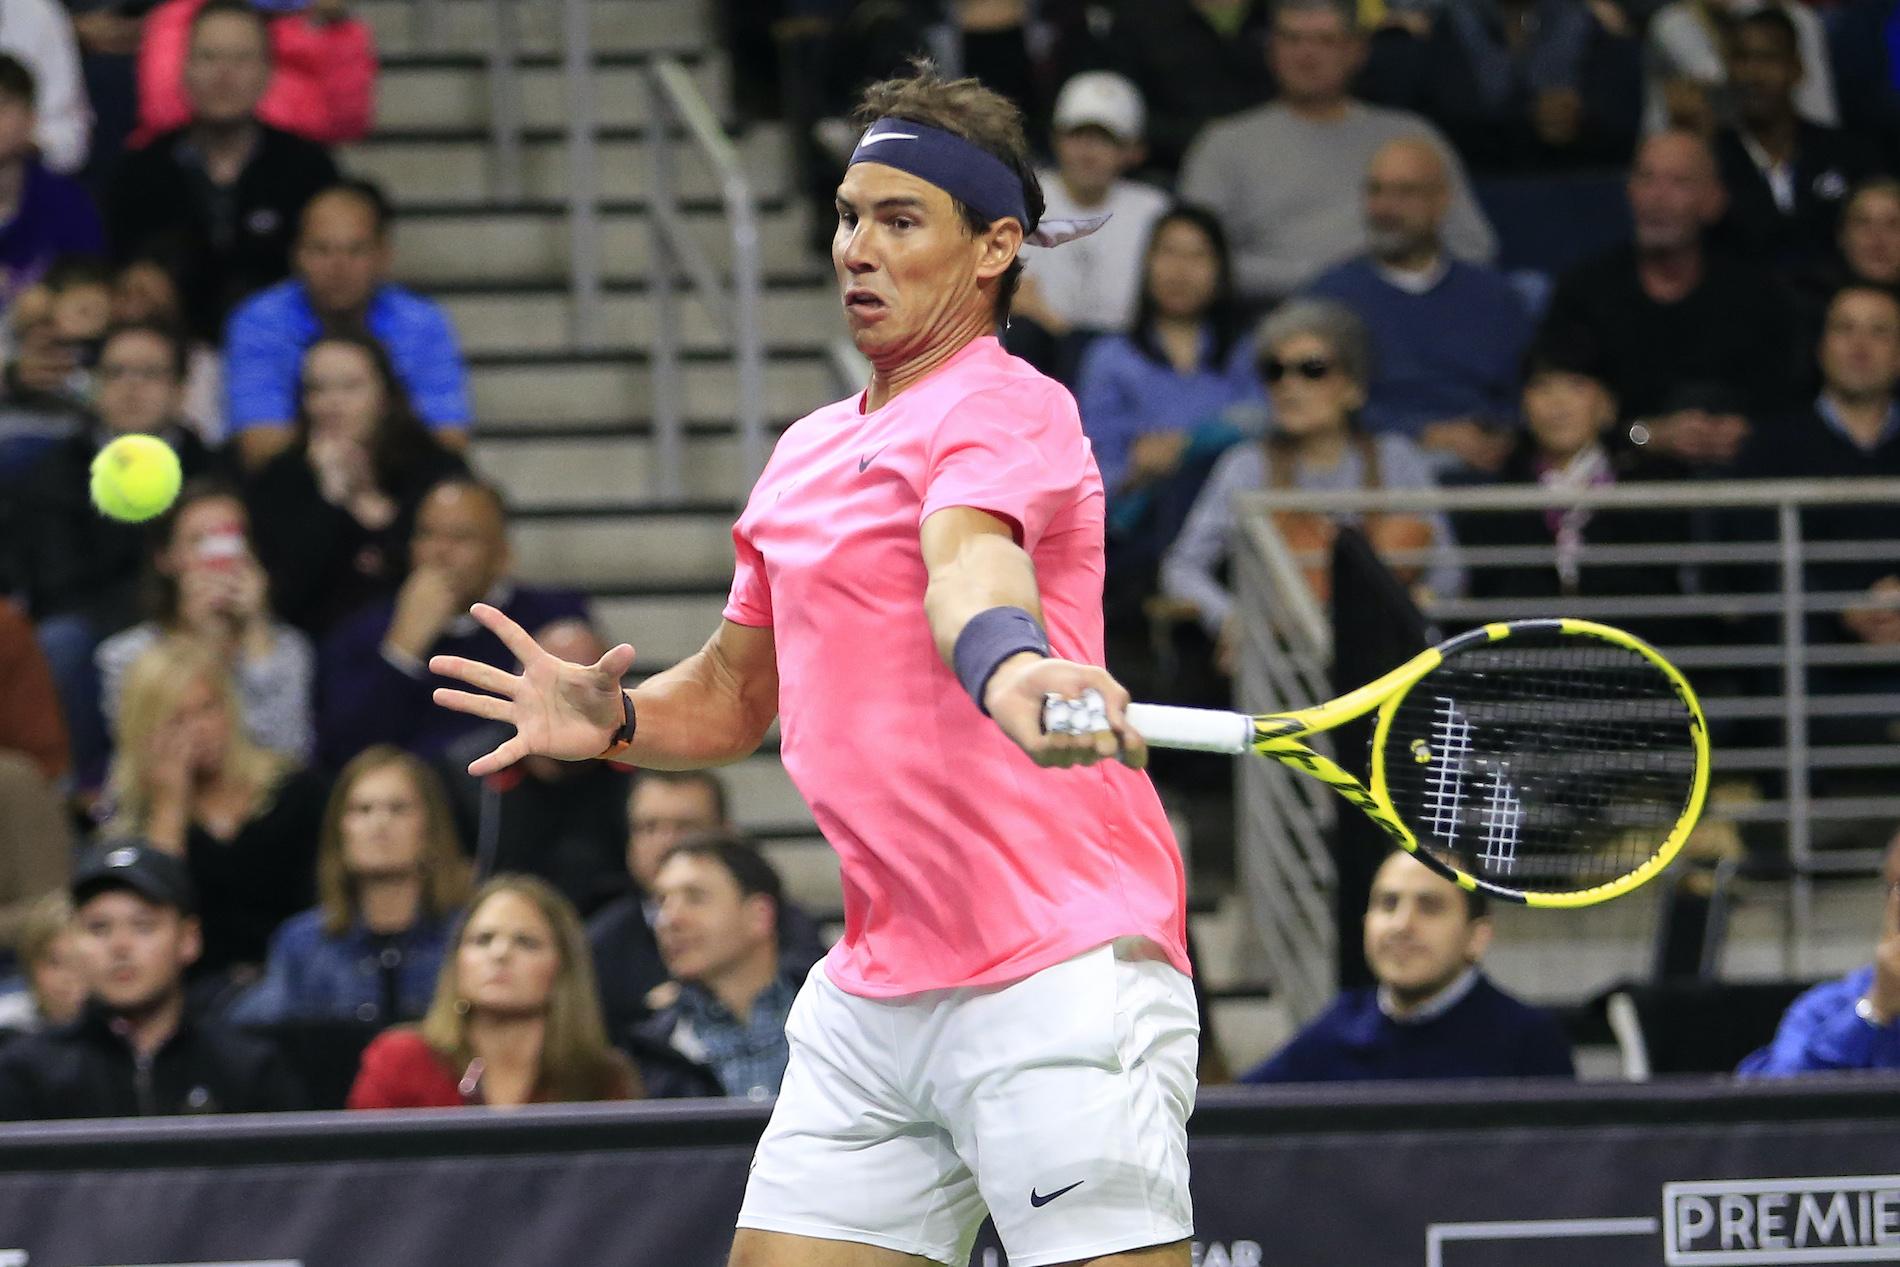 Rafael Nadal hits a forehand stroke